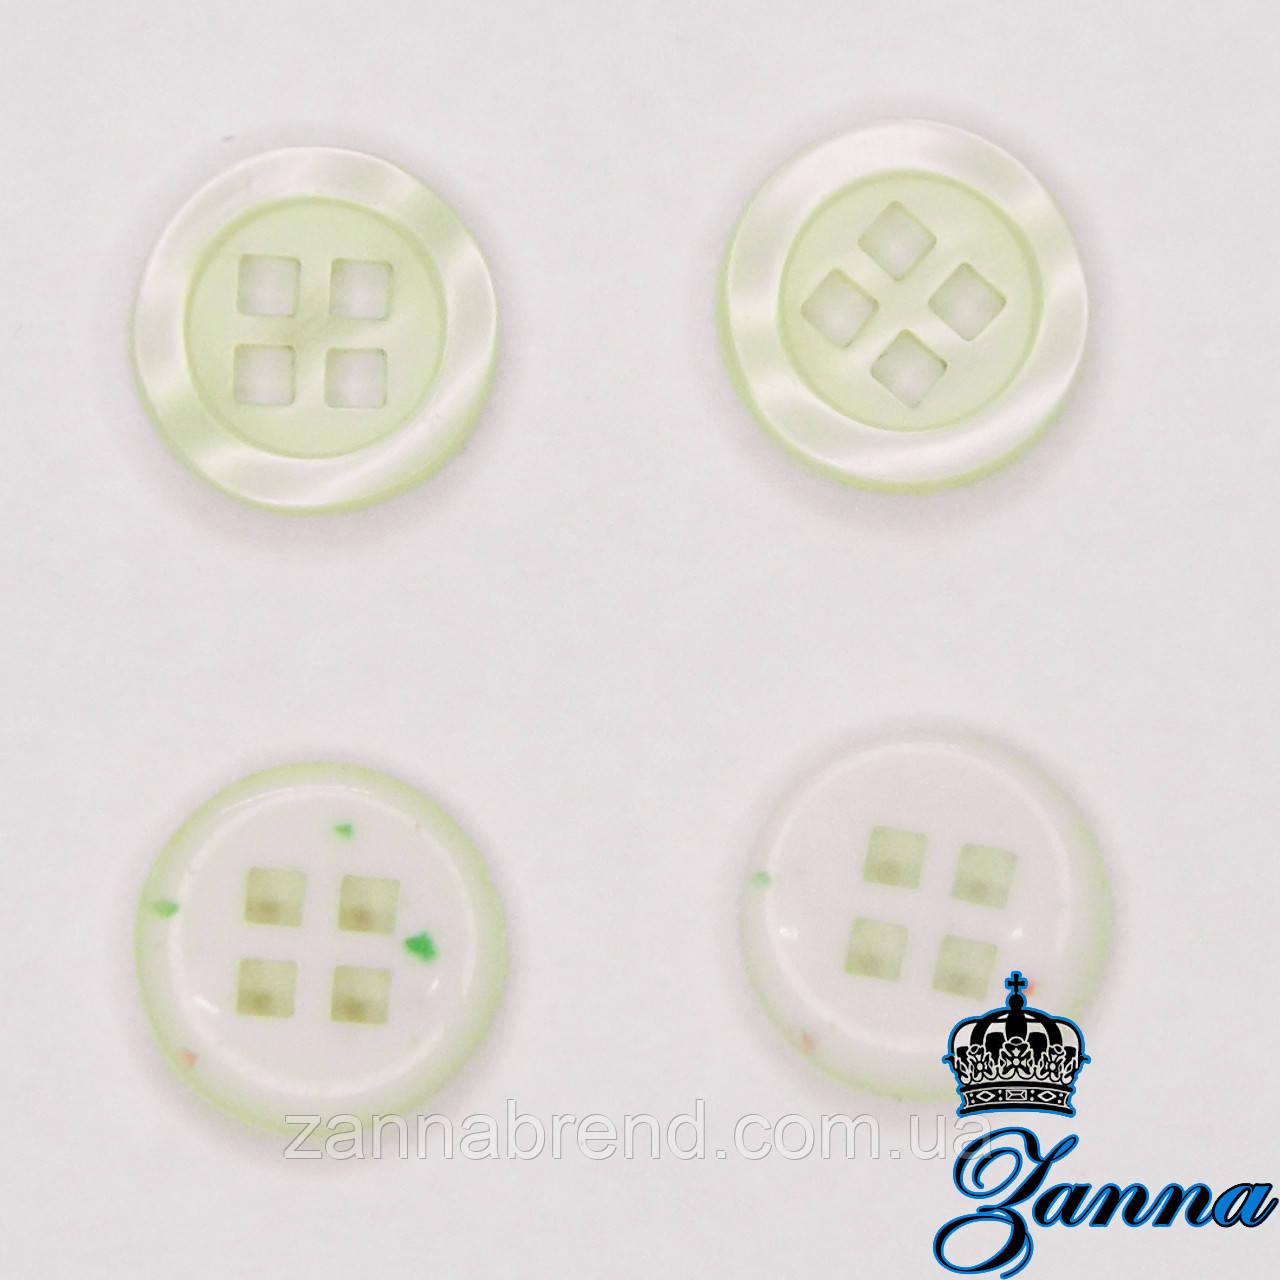 Пуговица (декор) пластиковая (18) молочного цвета 10 шт